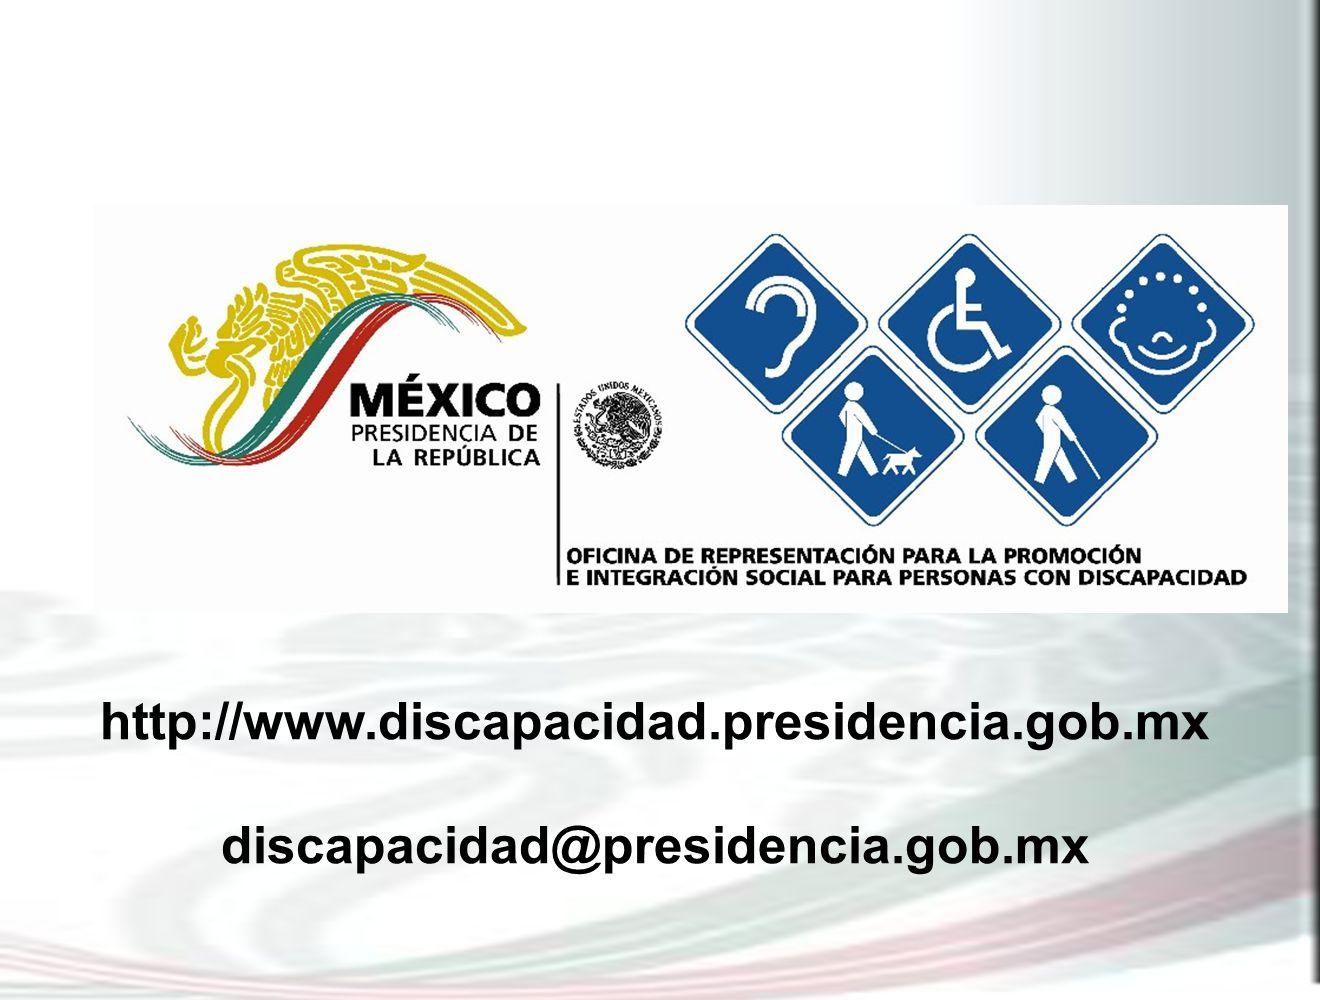 http://www.discapacidad.presidencia.gob.mx discapacidad@presidencia.gob.mx